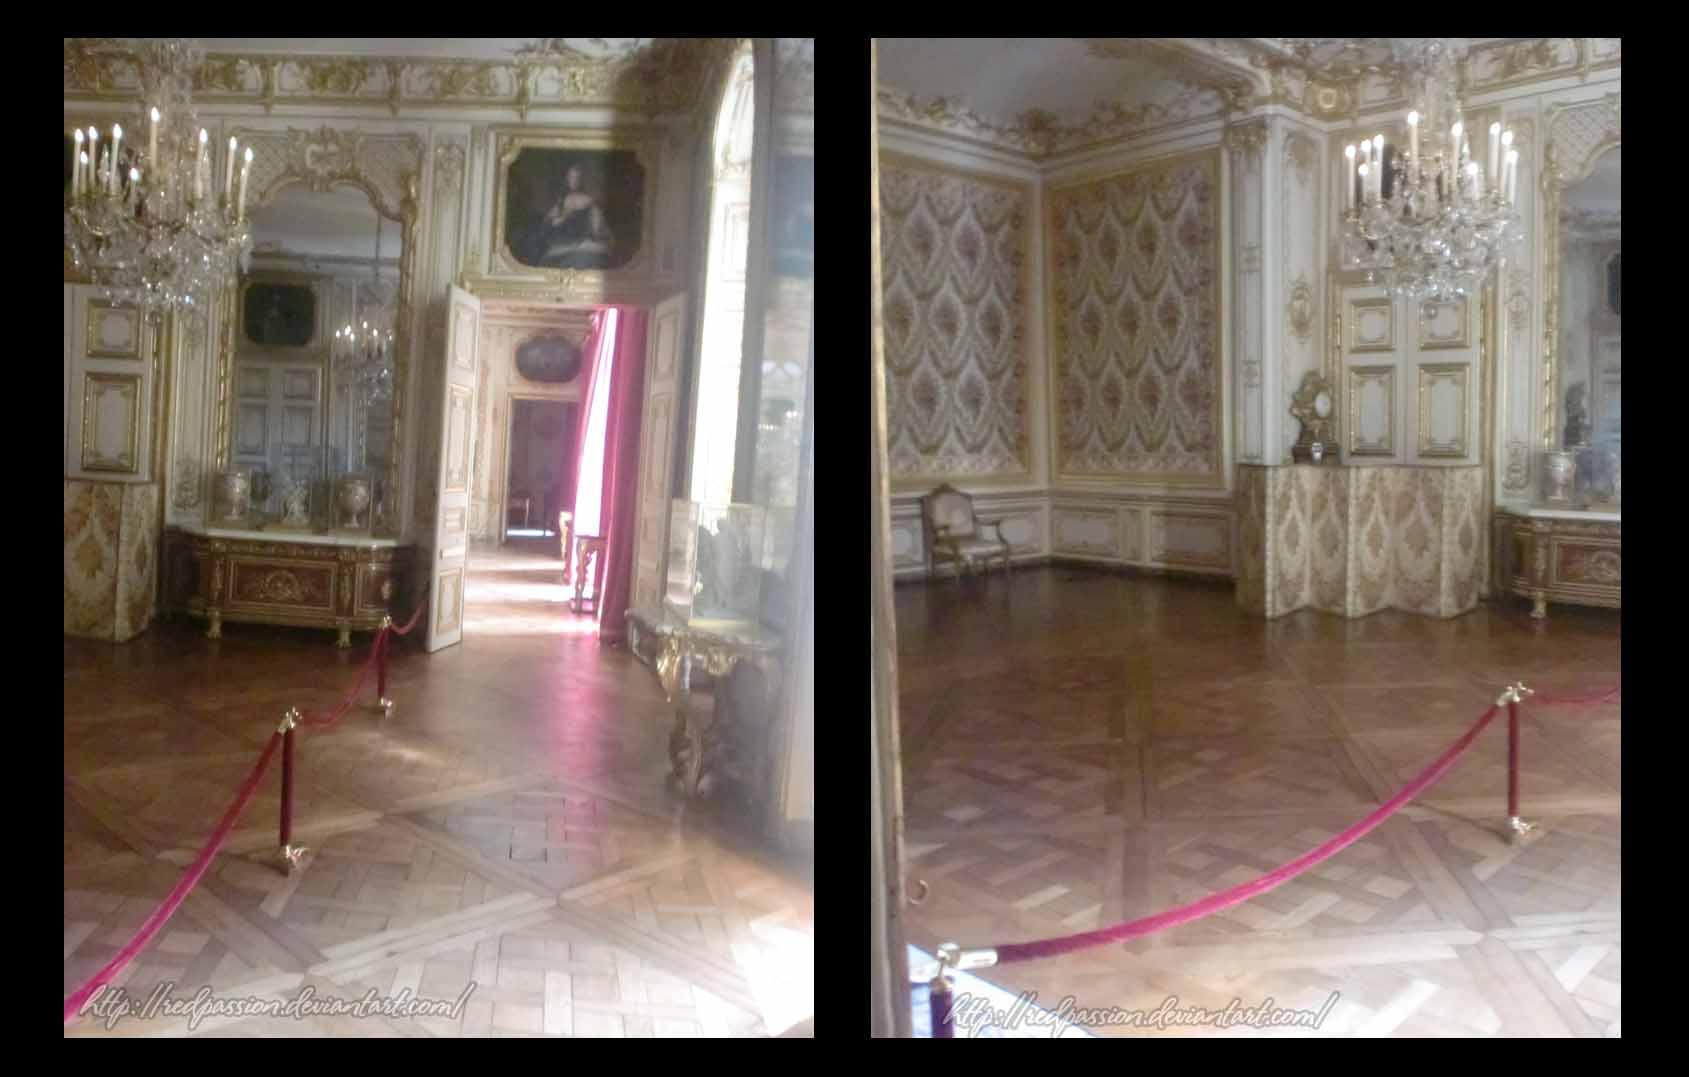 La chambre de louis xvi by redpassion on deviantart for Chambre louis xvi